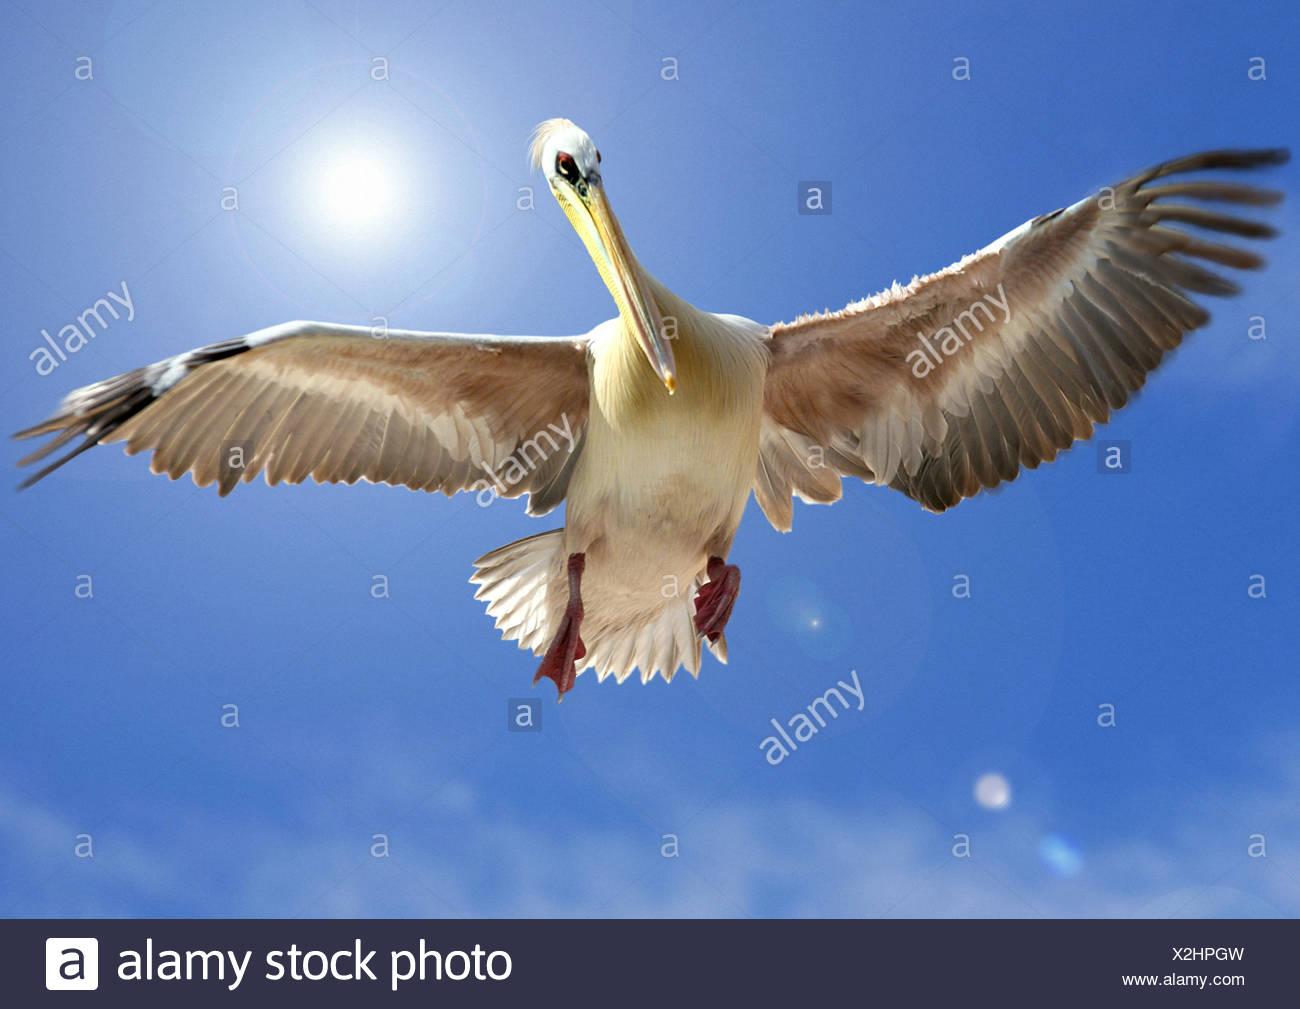 eastern white pelican (Pelecanus onocrotalus), flying - Stock Image